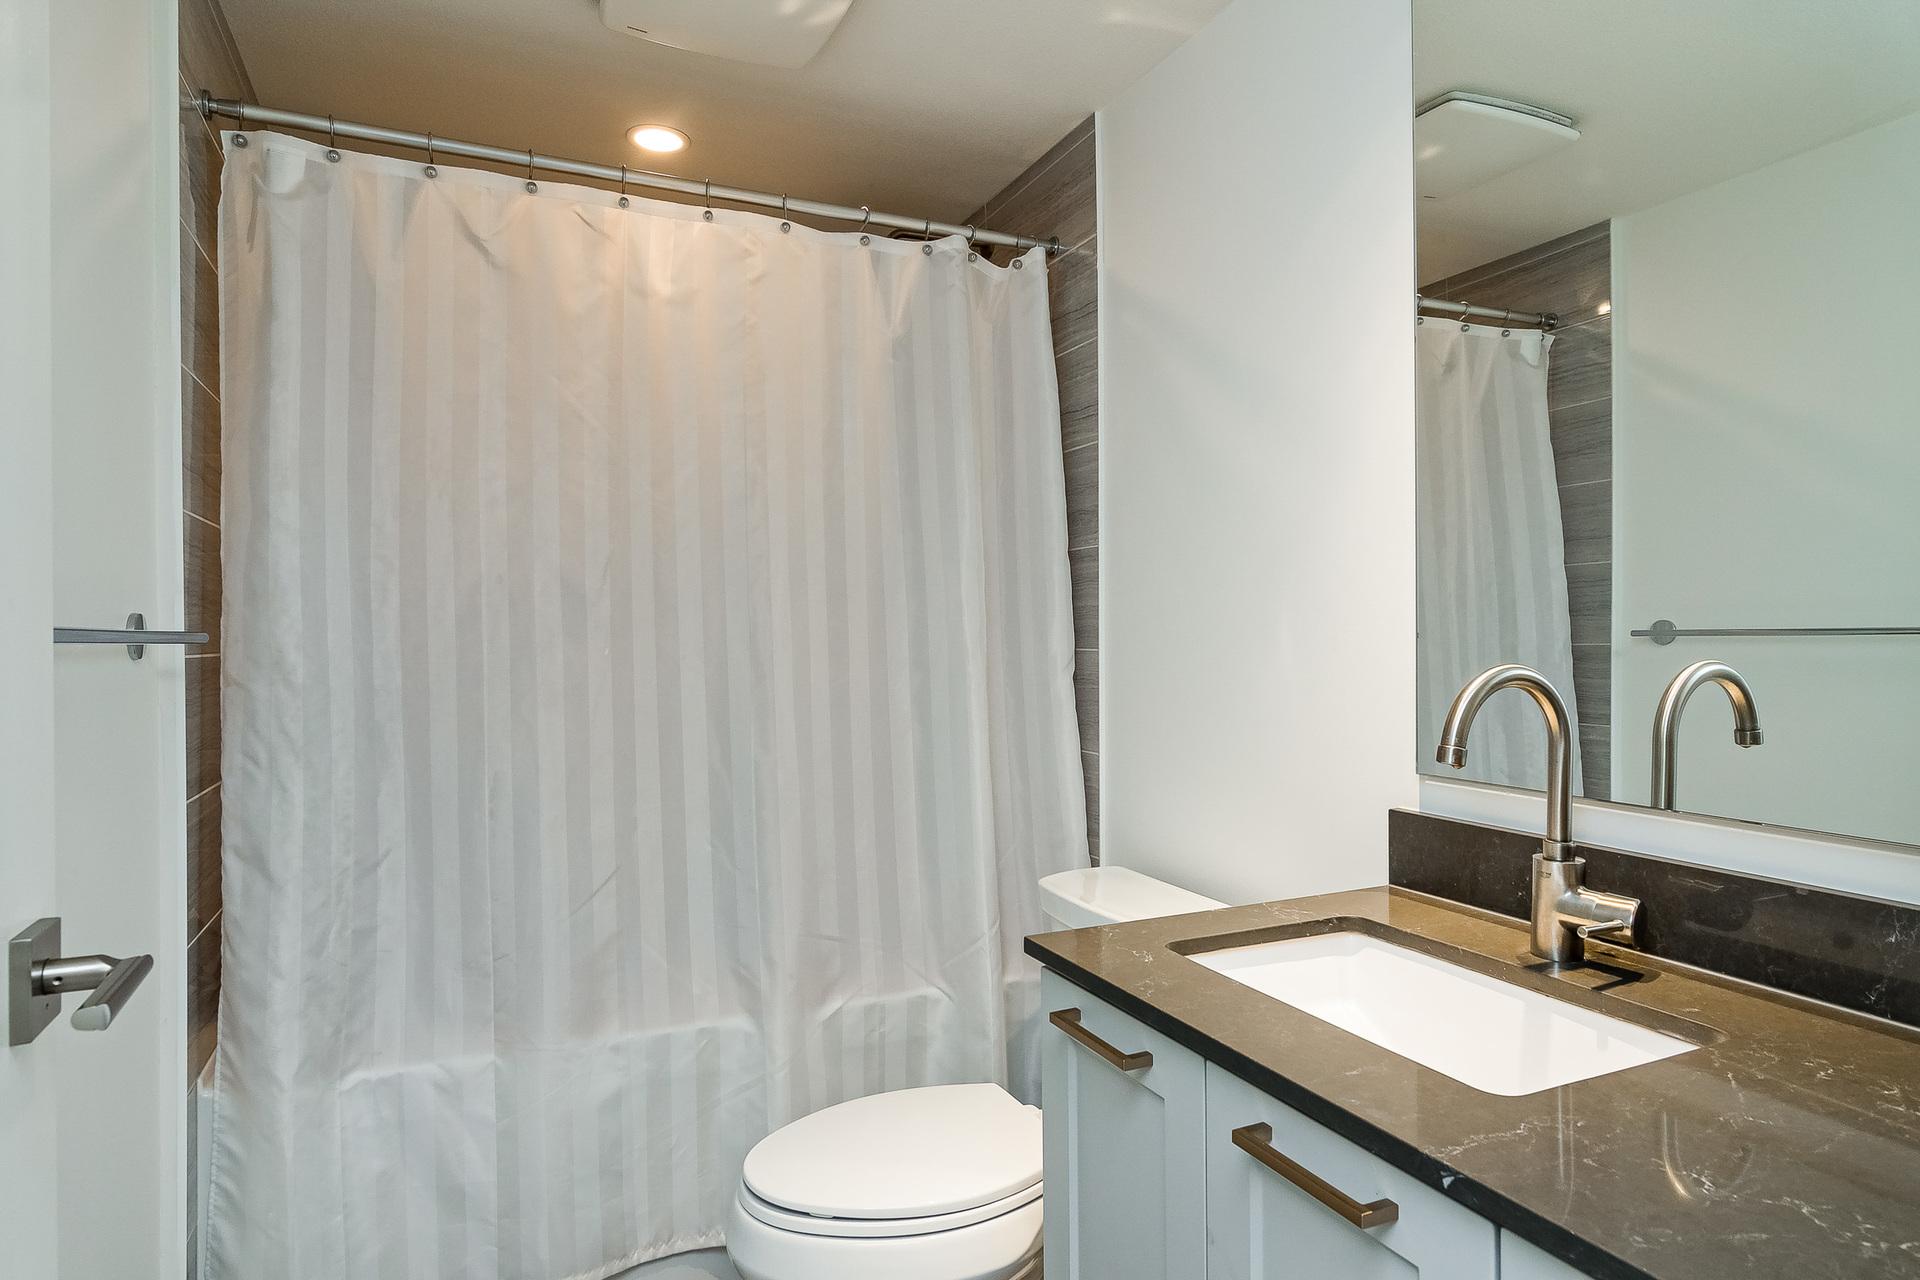 Upstairs Bathroom  at 7 - 2825 159 Street, Grandview Surrey, South Surrey White Rock